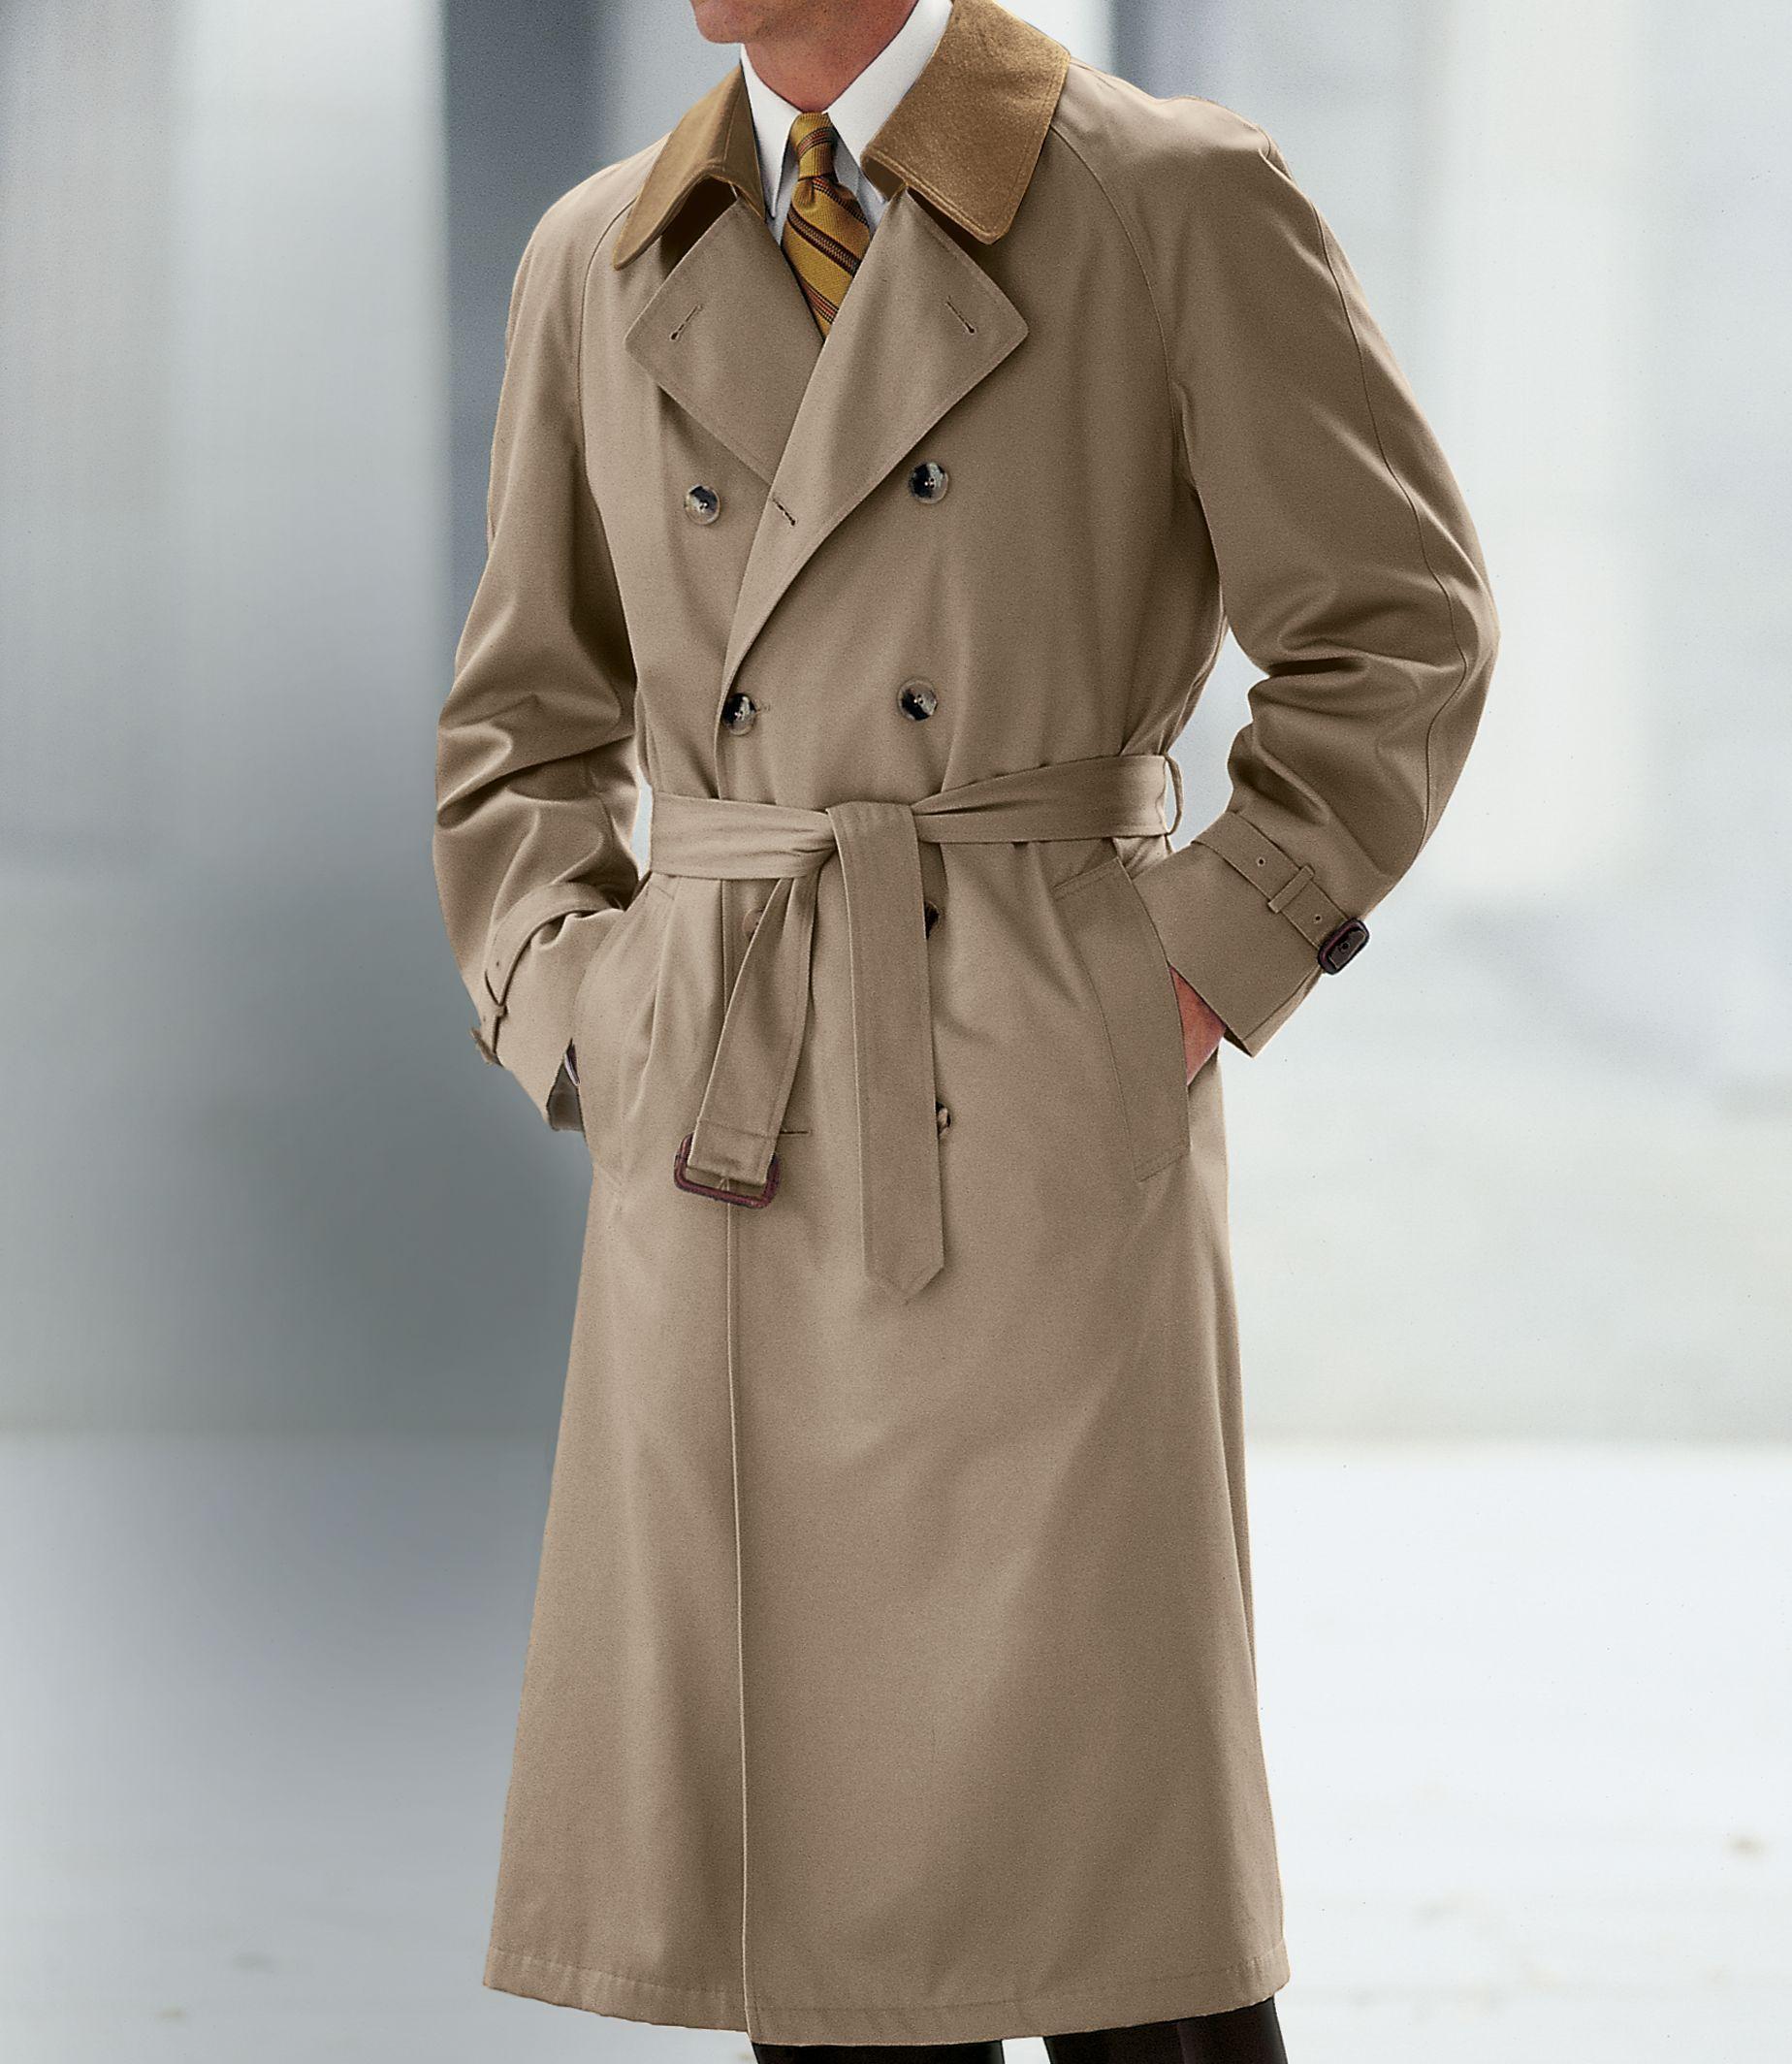 1940s Style Men's Clothing: Suits, Shirts, Pants, Hats ...